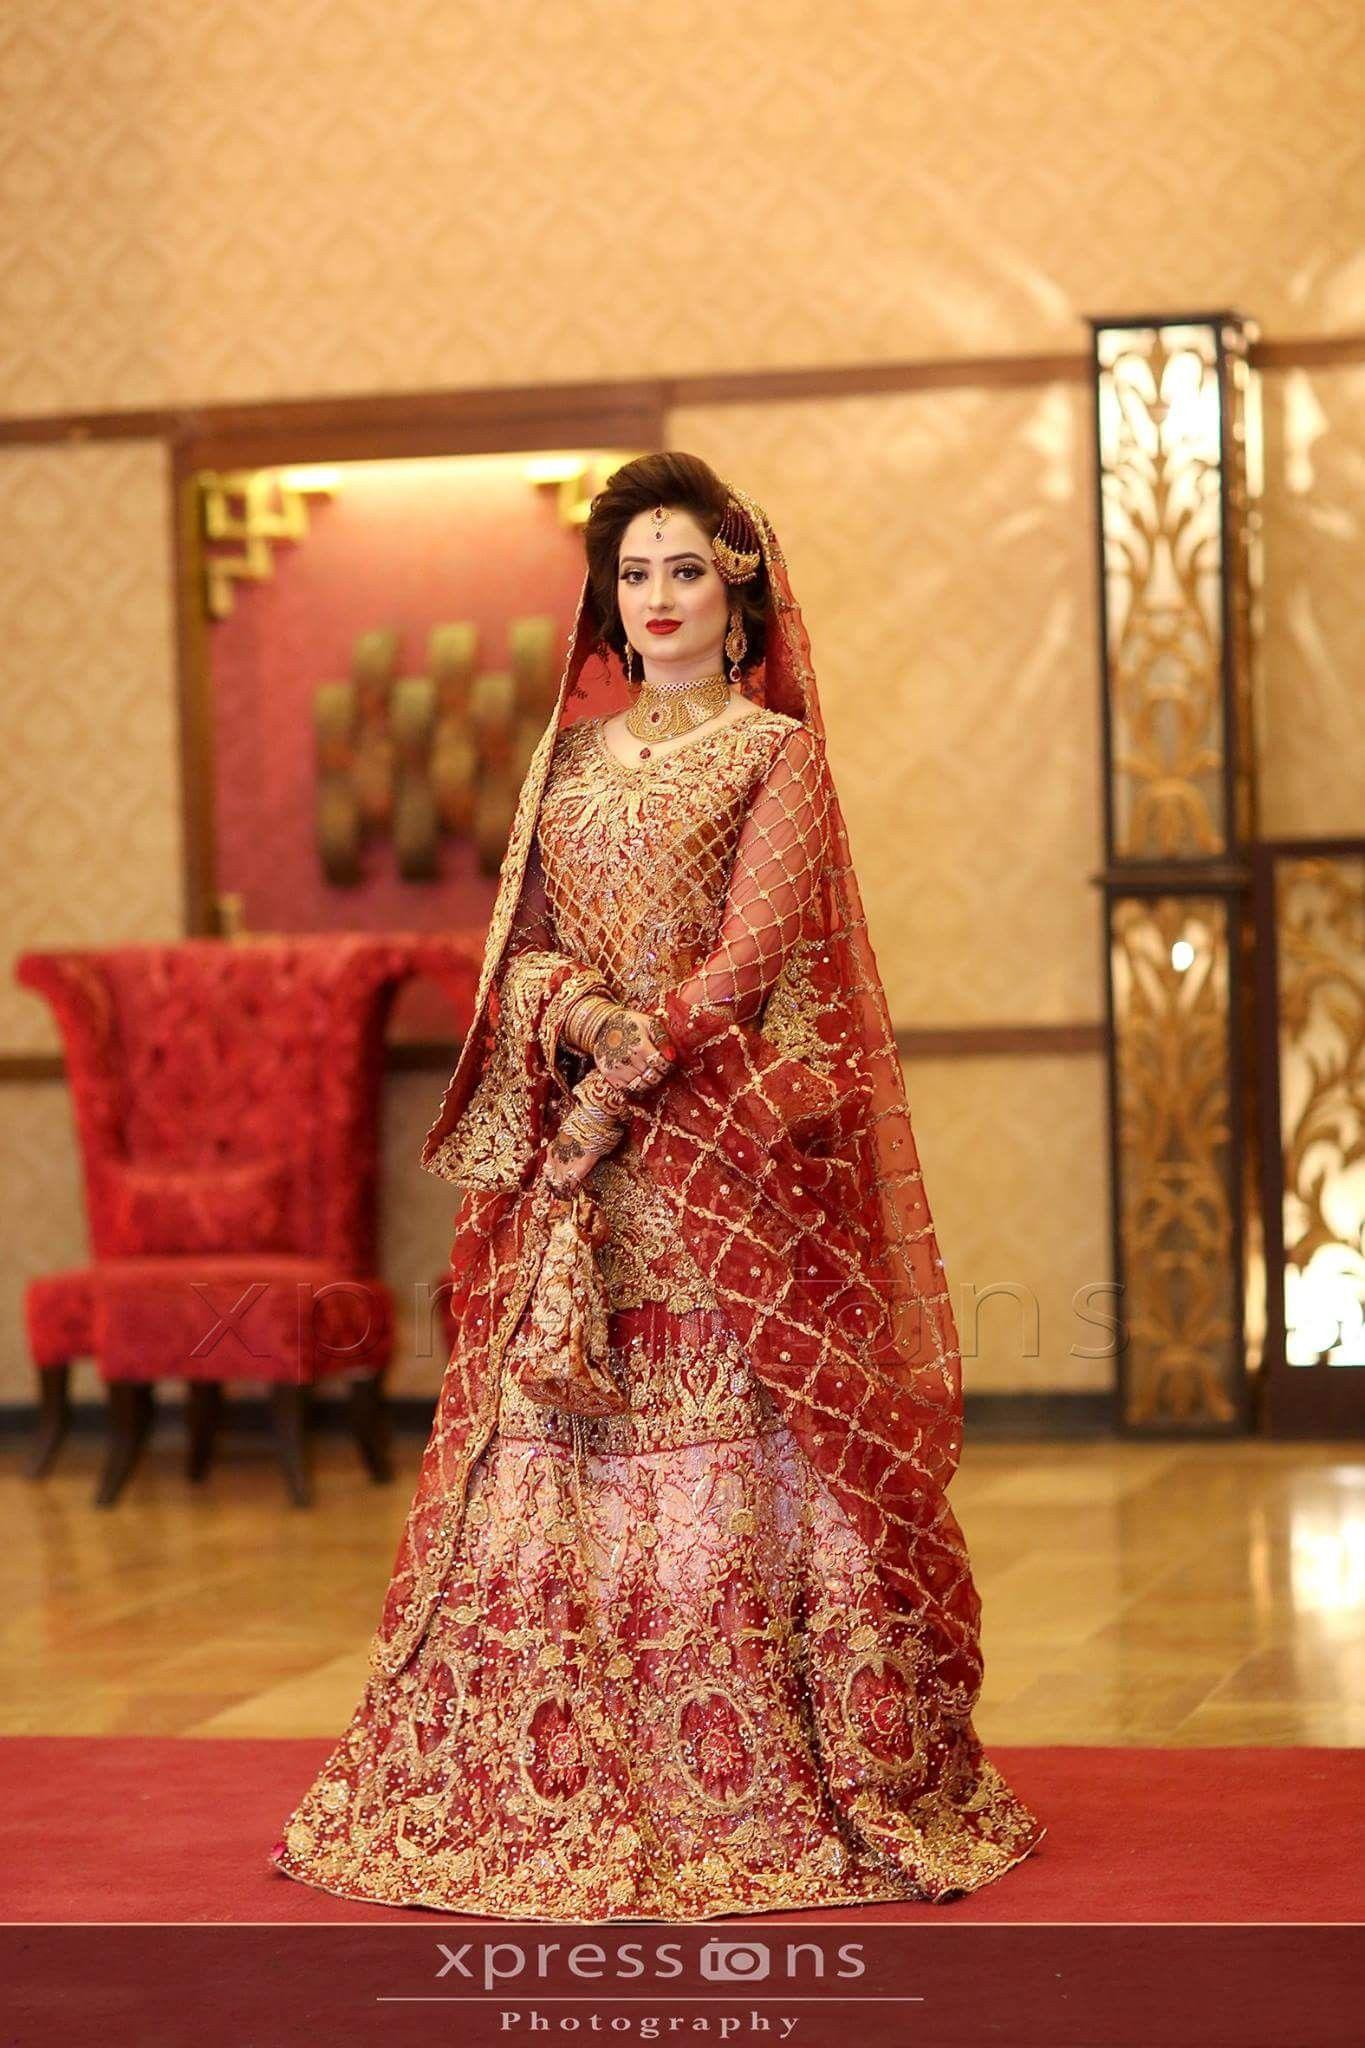 Pin by Sidra Naeem on Weddings | Pinterest | Pakistani, Bridal ...